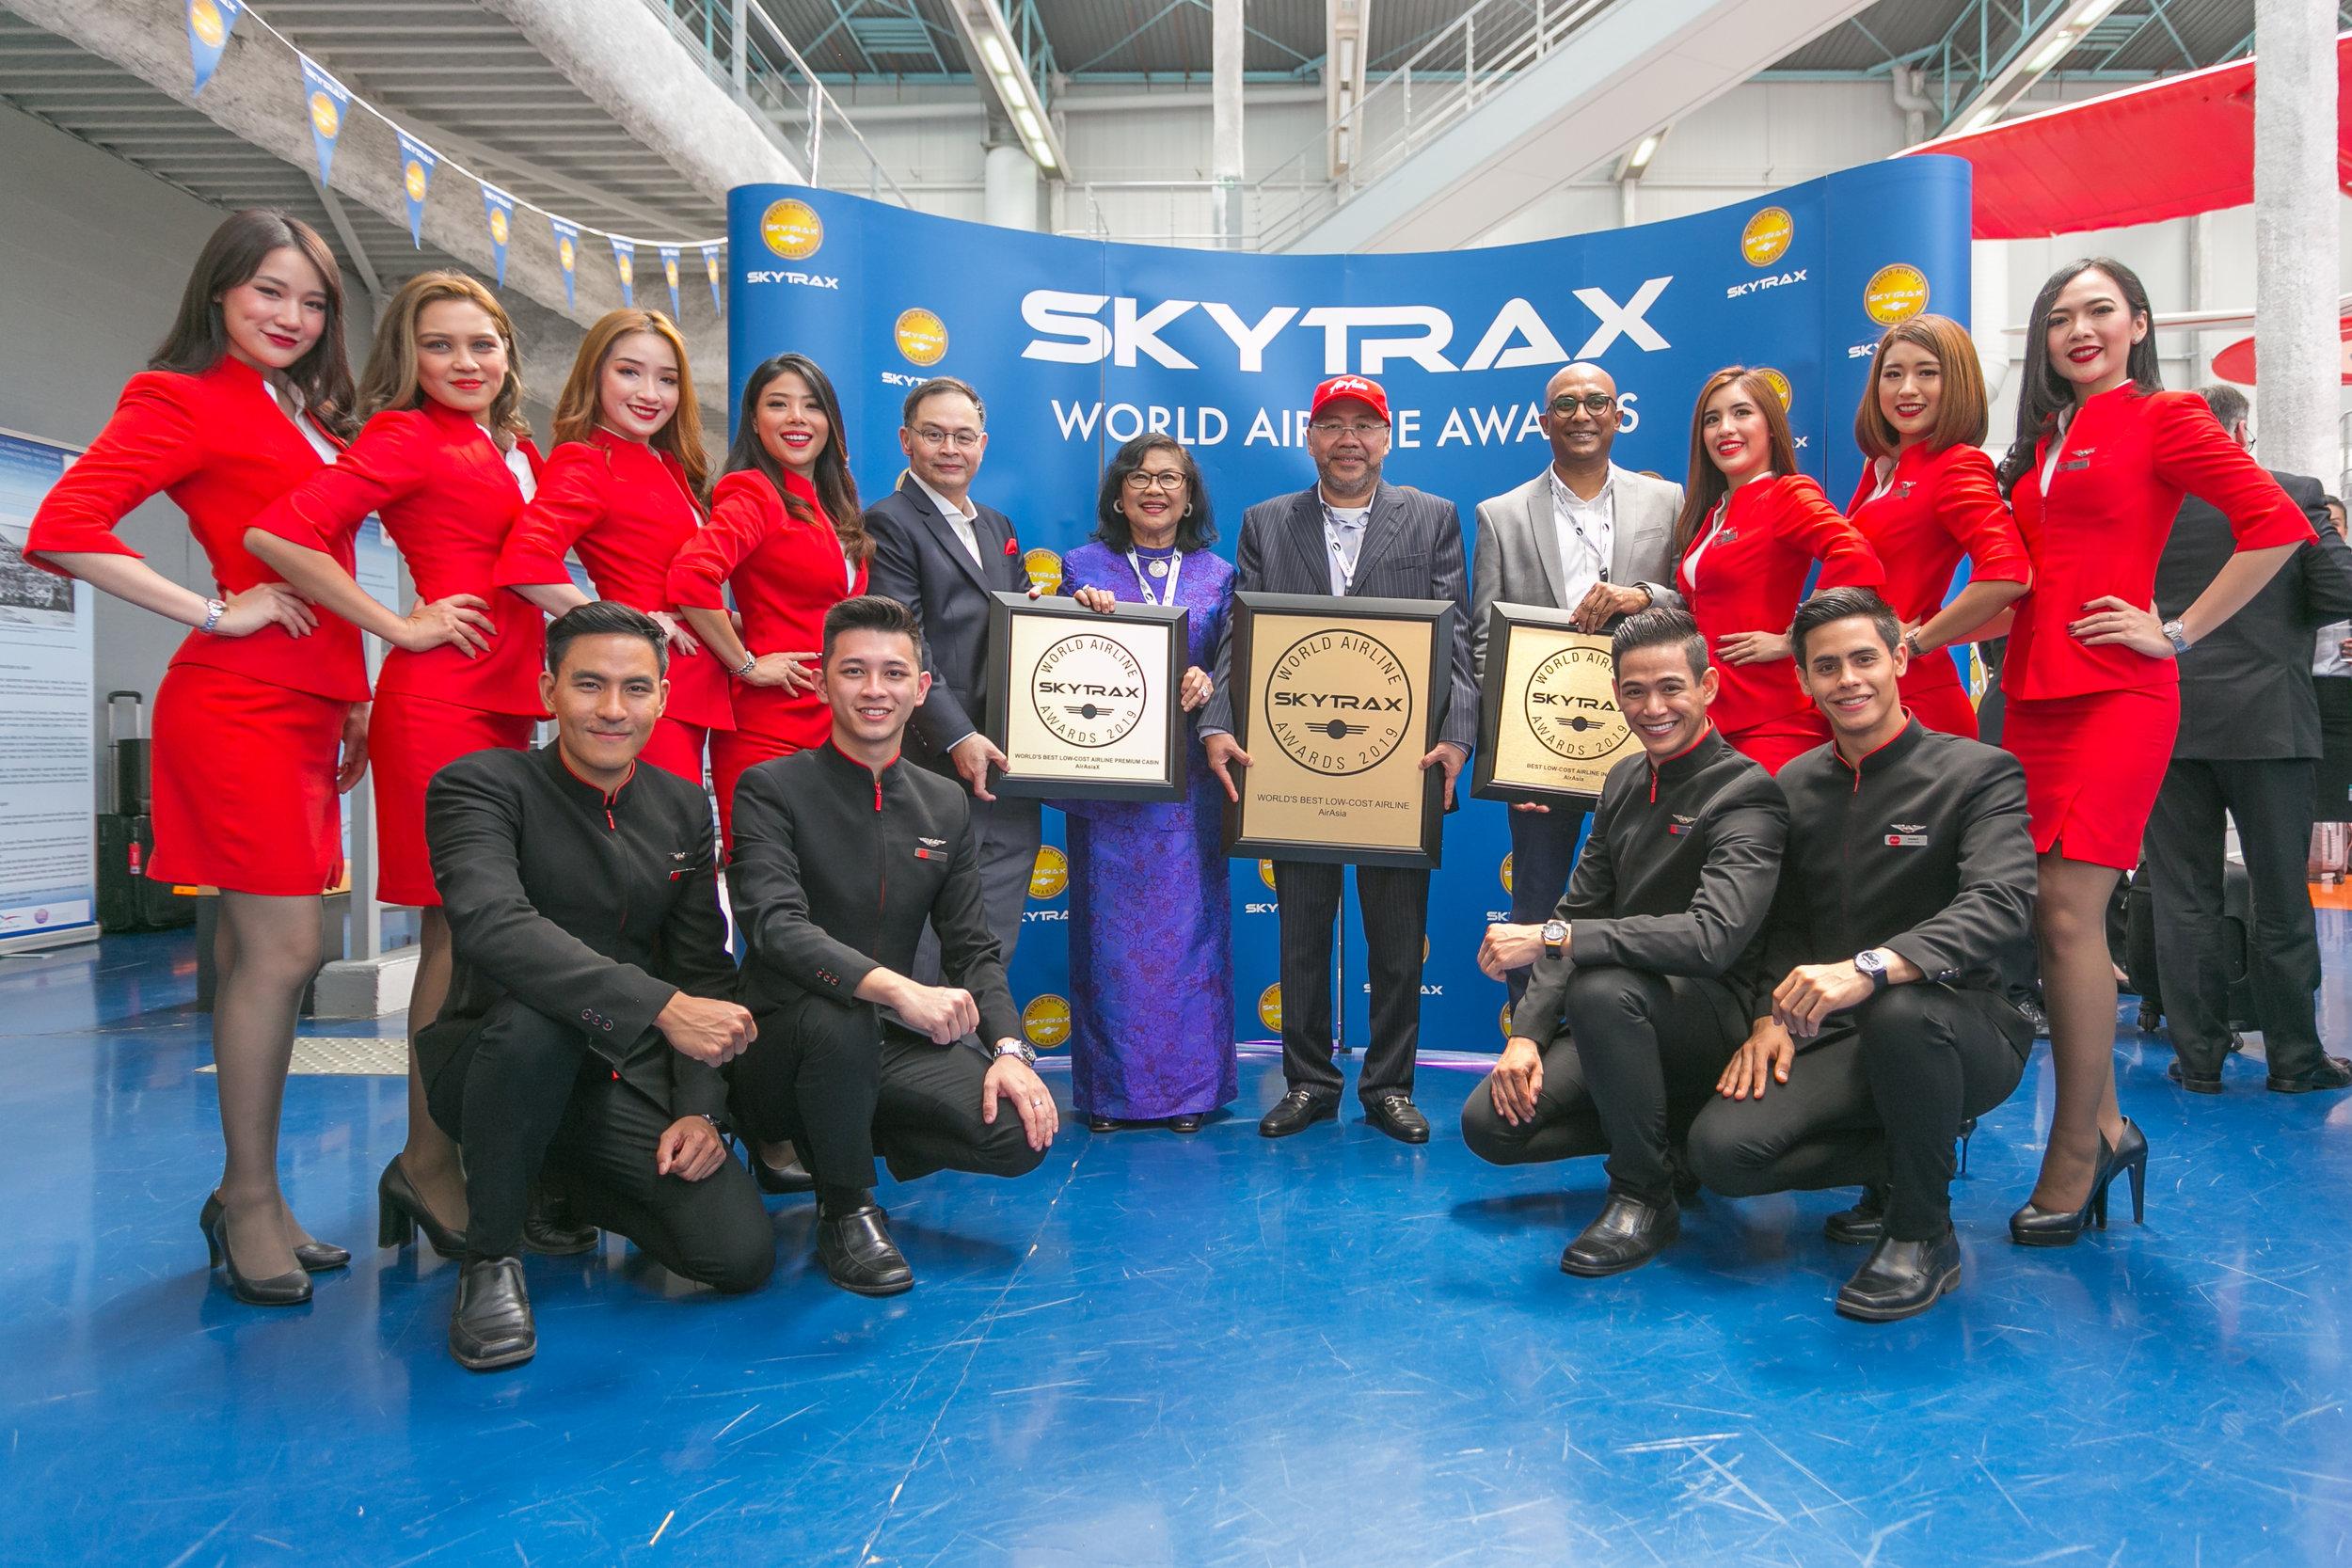 Photo Caption: (Rear fifth from left: AirAsia X Group CEO Nadda Buranasiri, AirAsia X Berhad Chairman Tan Sri Rafidah Aziz, AirAsia Group Berhad Executive Chairman Datuk Kamarudin Meranun, AirAsia Deputy Group CEO (Airlines) Bo Lingam flanked by AirAsia Cabin Crew